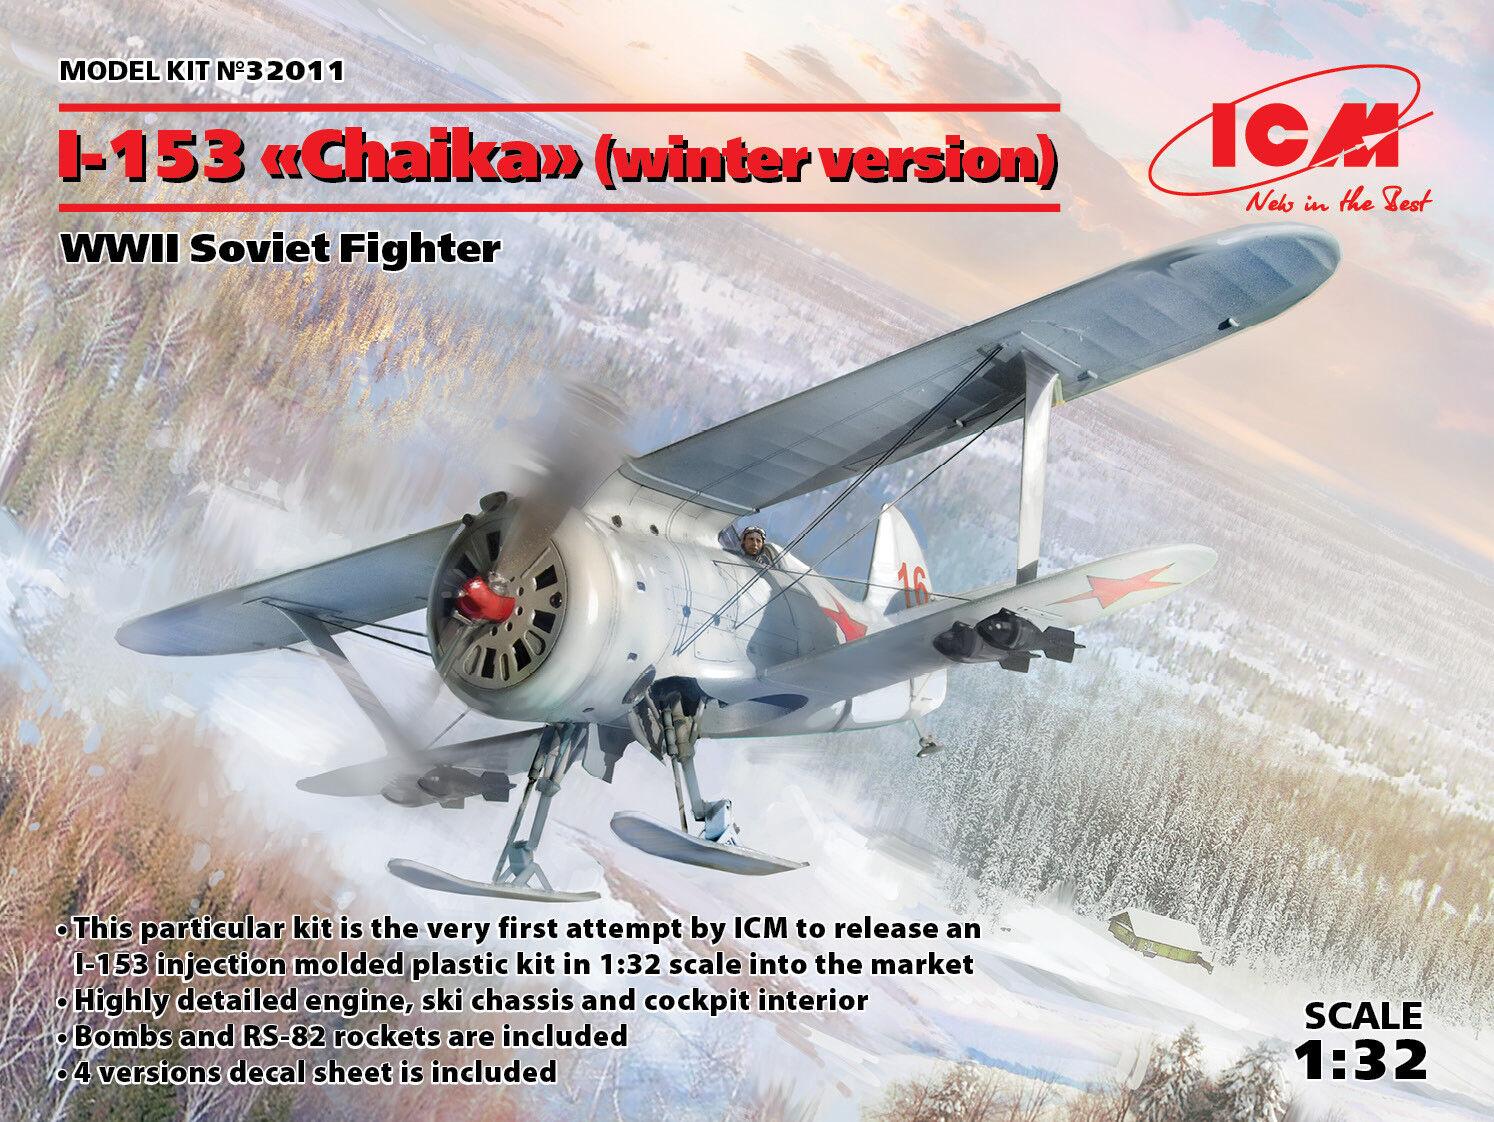 Icm 1 32 Polikarpov I-153 Chaika (Inverno Versione)  32011